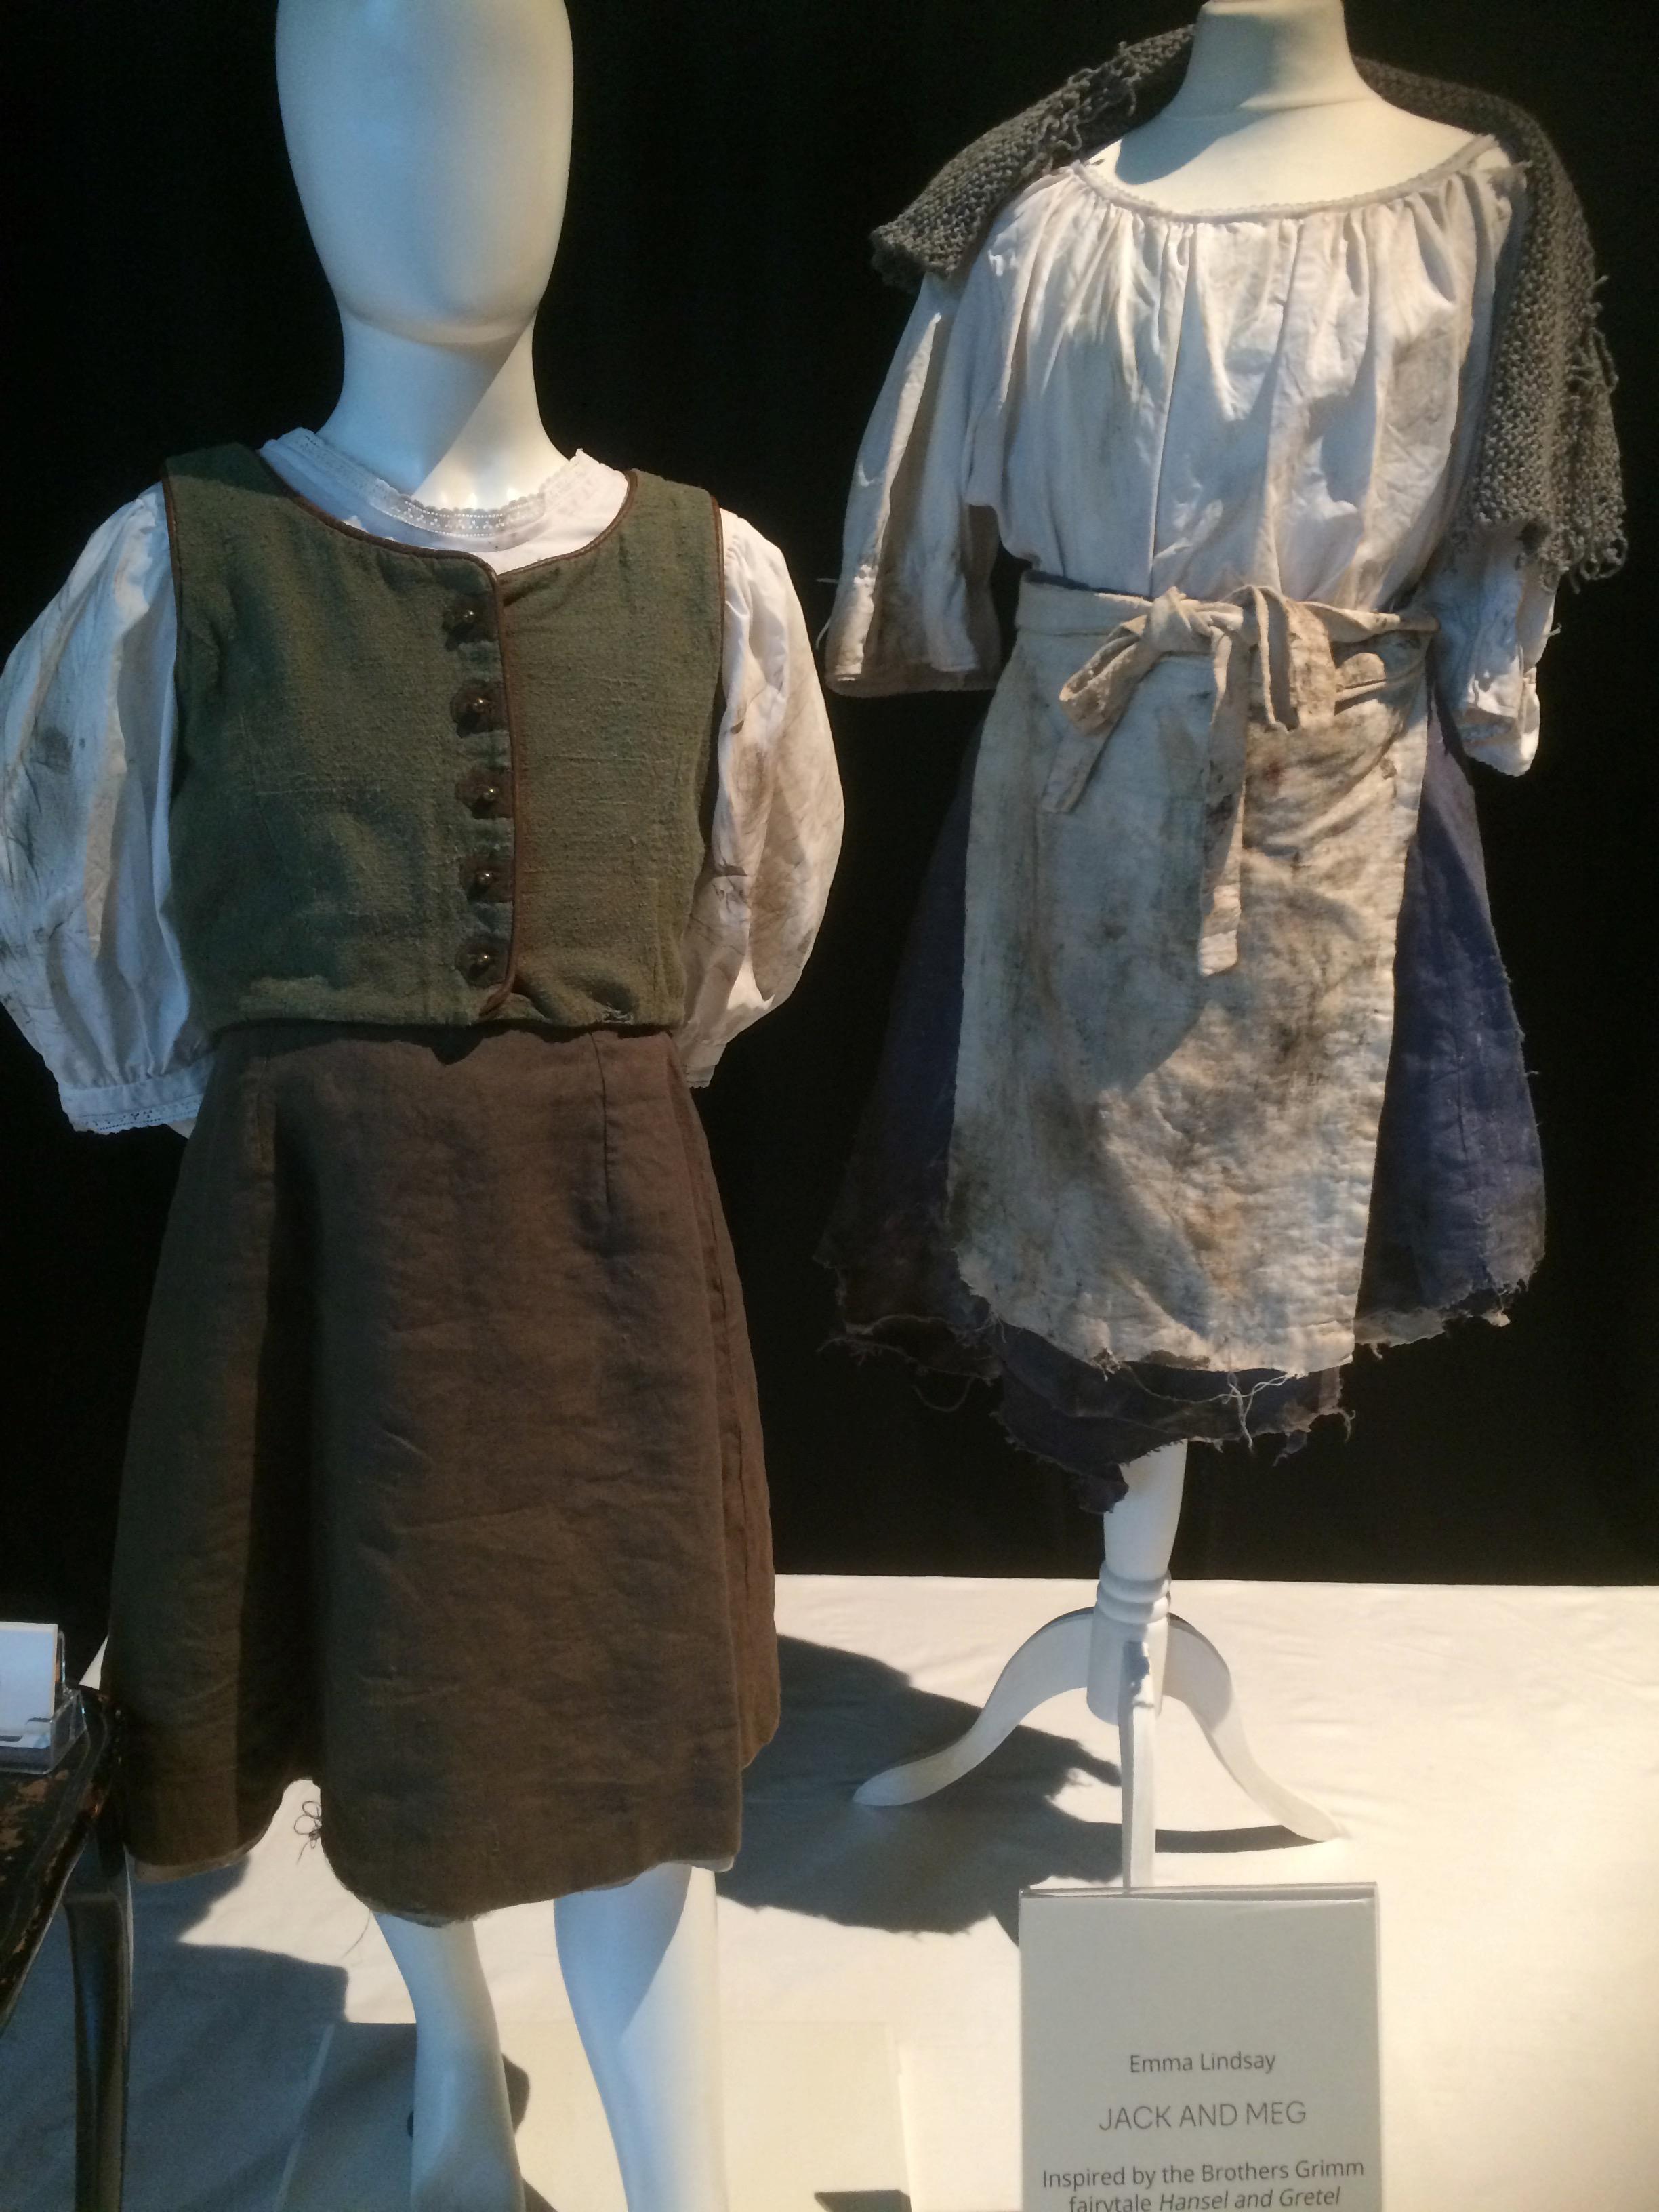 Emma Lindsay Hansel and Gretl costumes